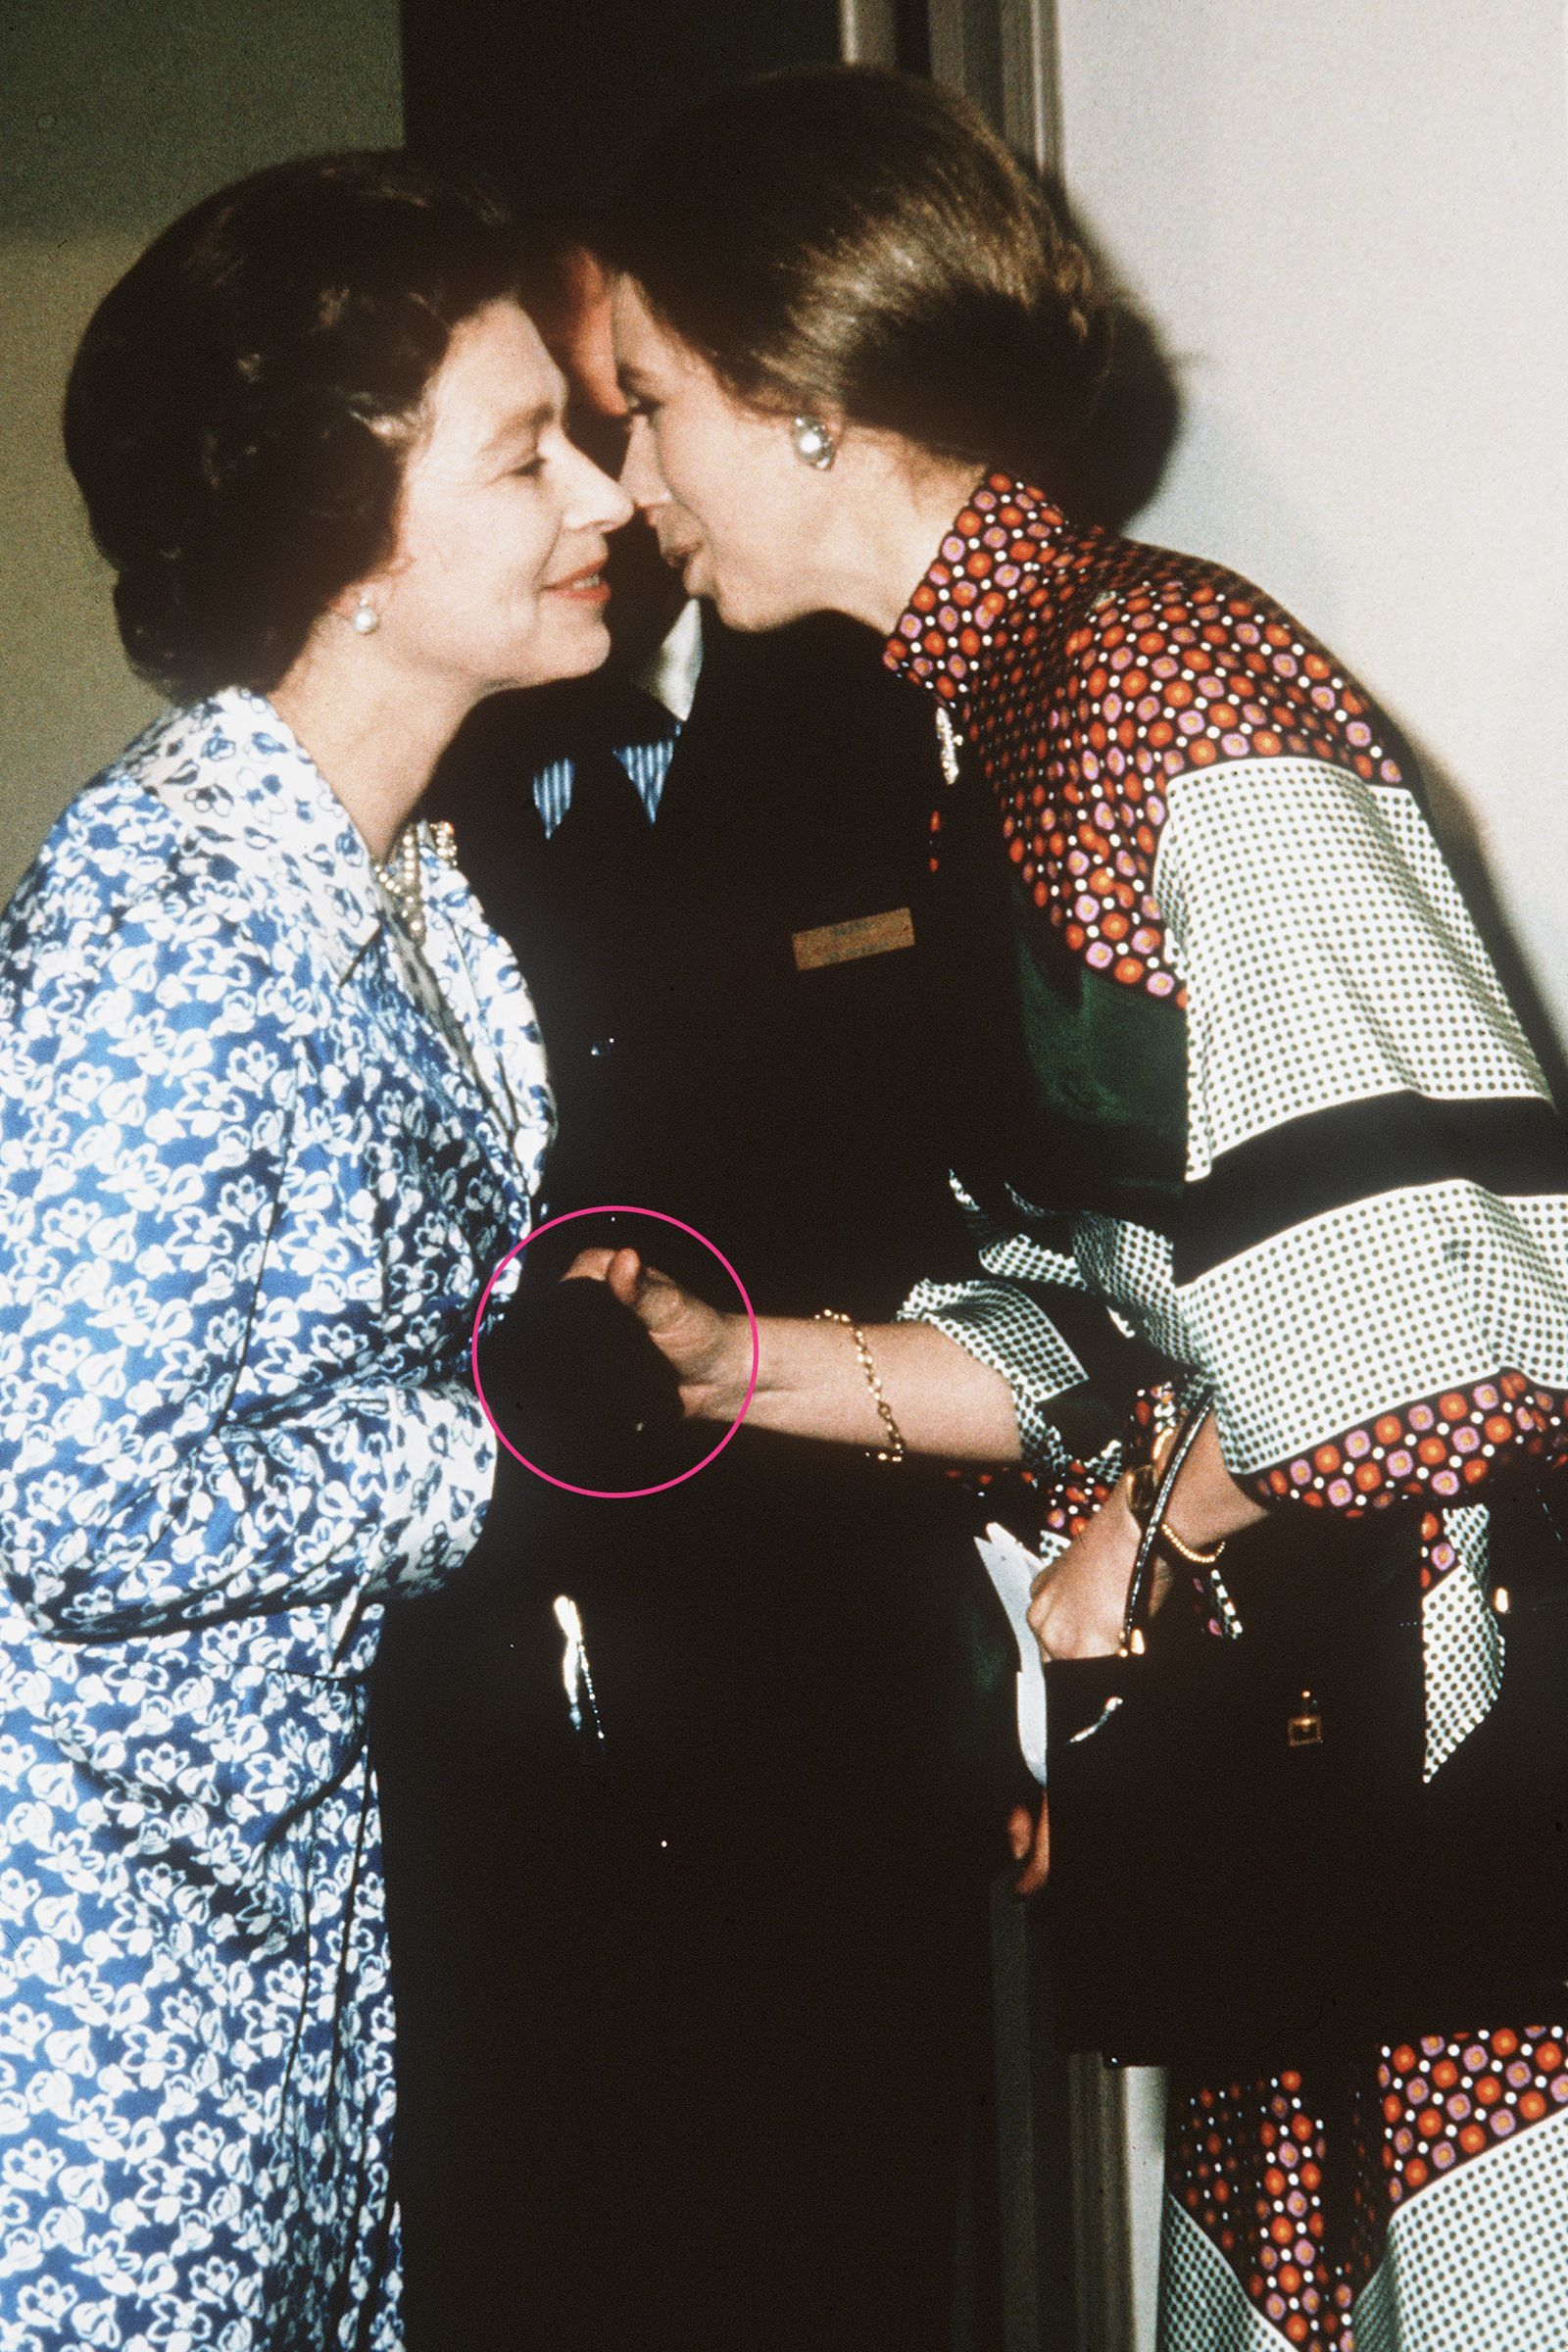 Body Language Experts Analyze Queen Elizabeth's